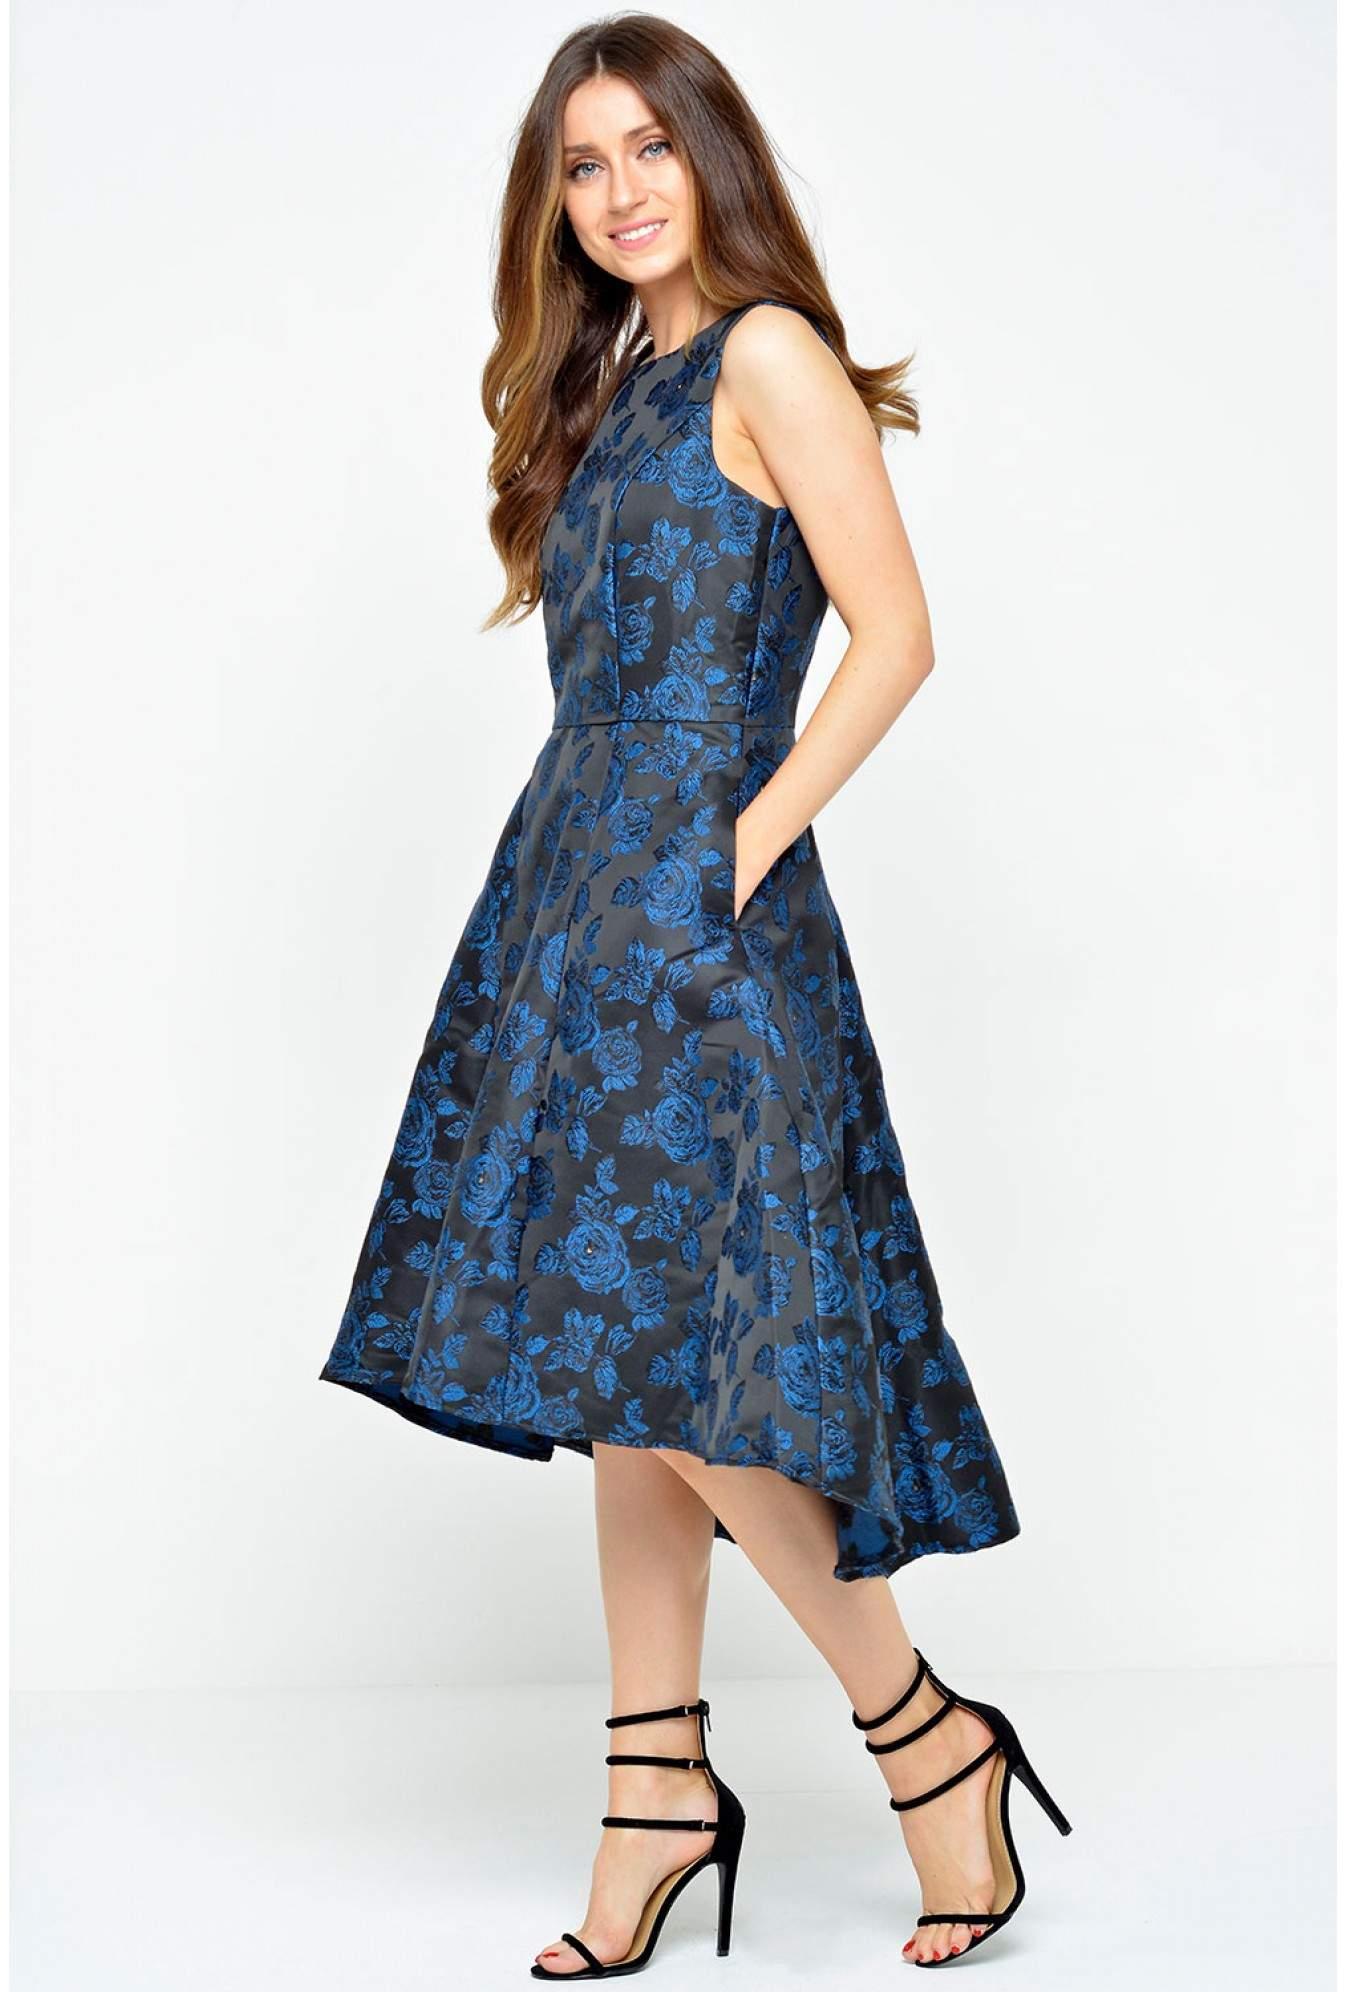 1058b6a9fb81 Marc Angelo Sally Brocade Dress in Royal Blue | iCLOTHING